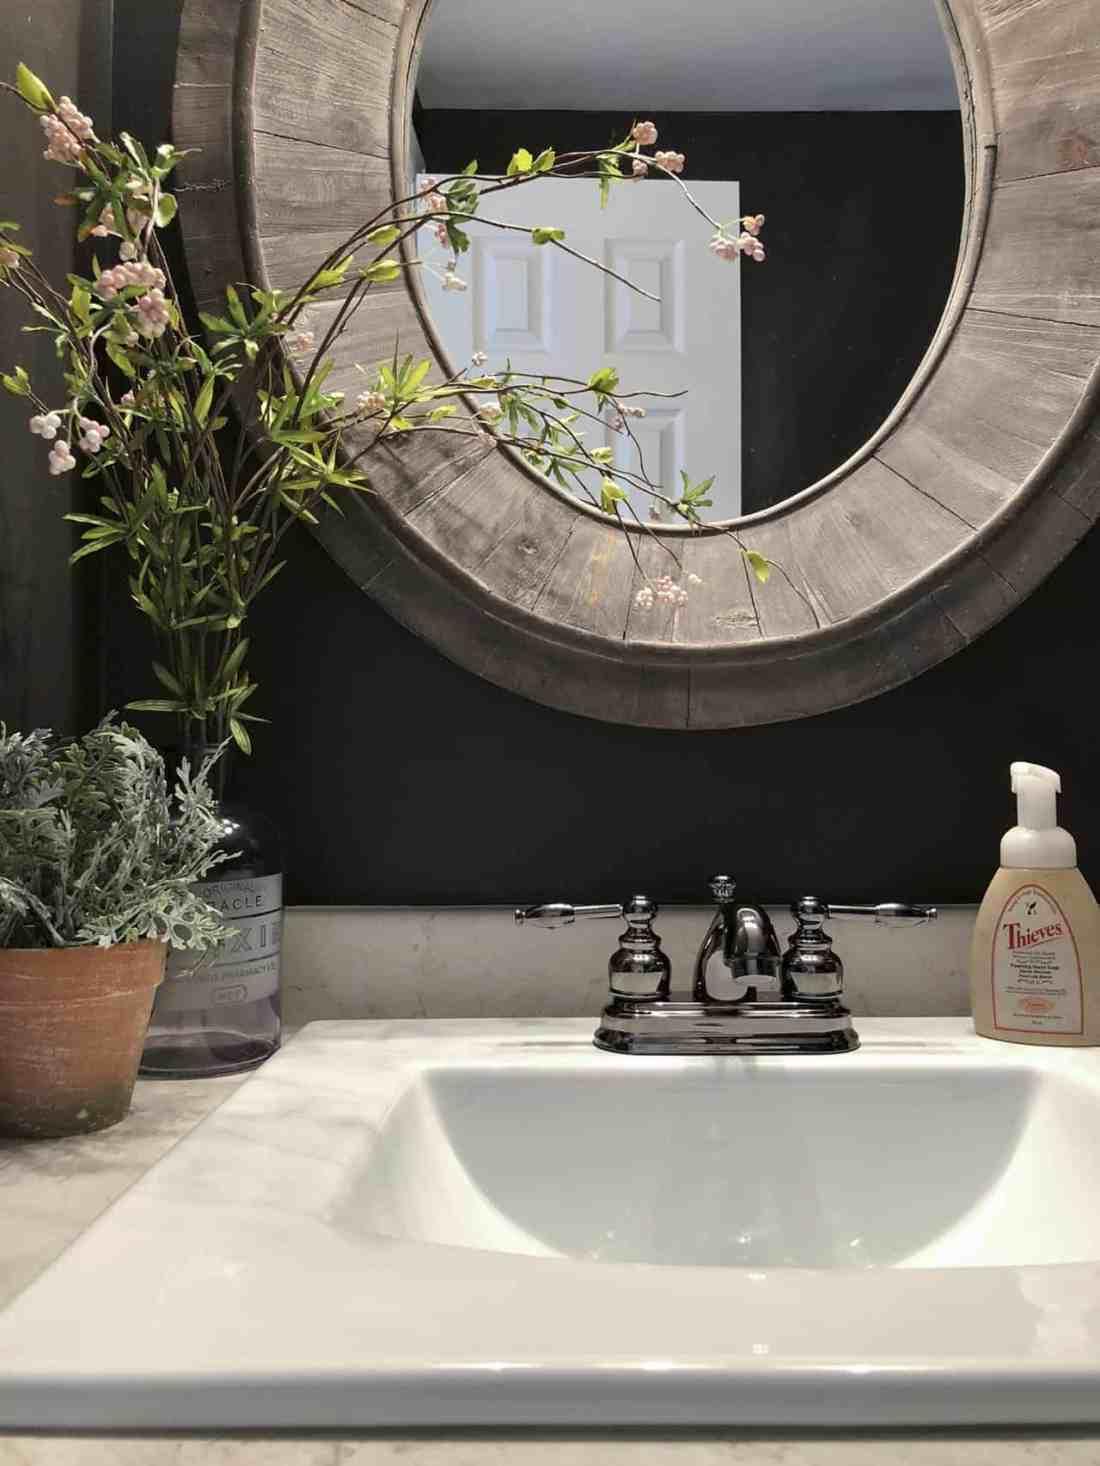 Wood oval mirror black walls white sink black faucet